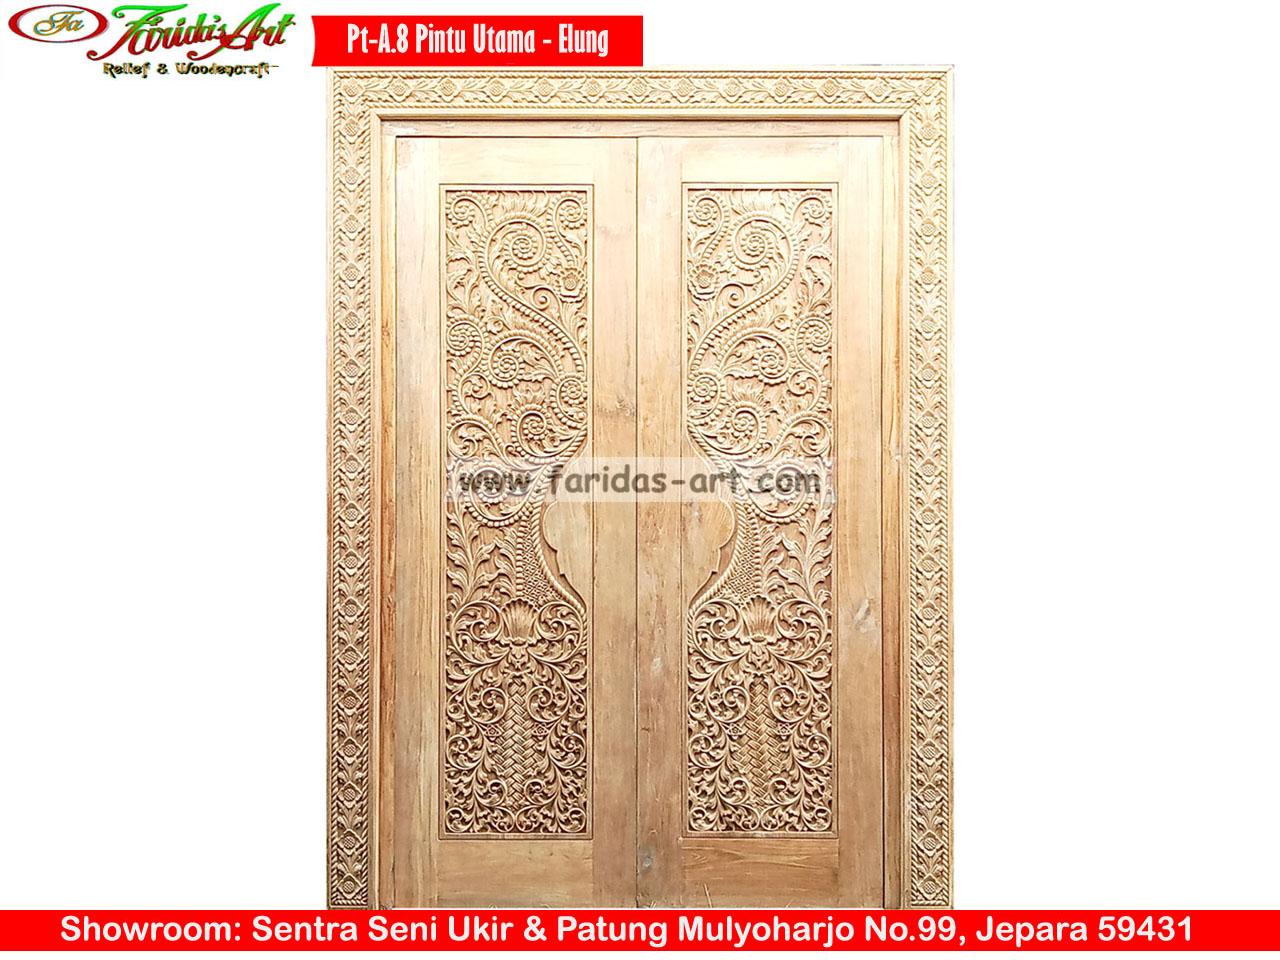 Pintu Utama - Elung